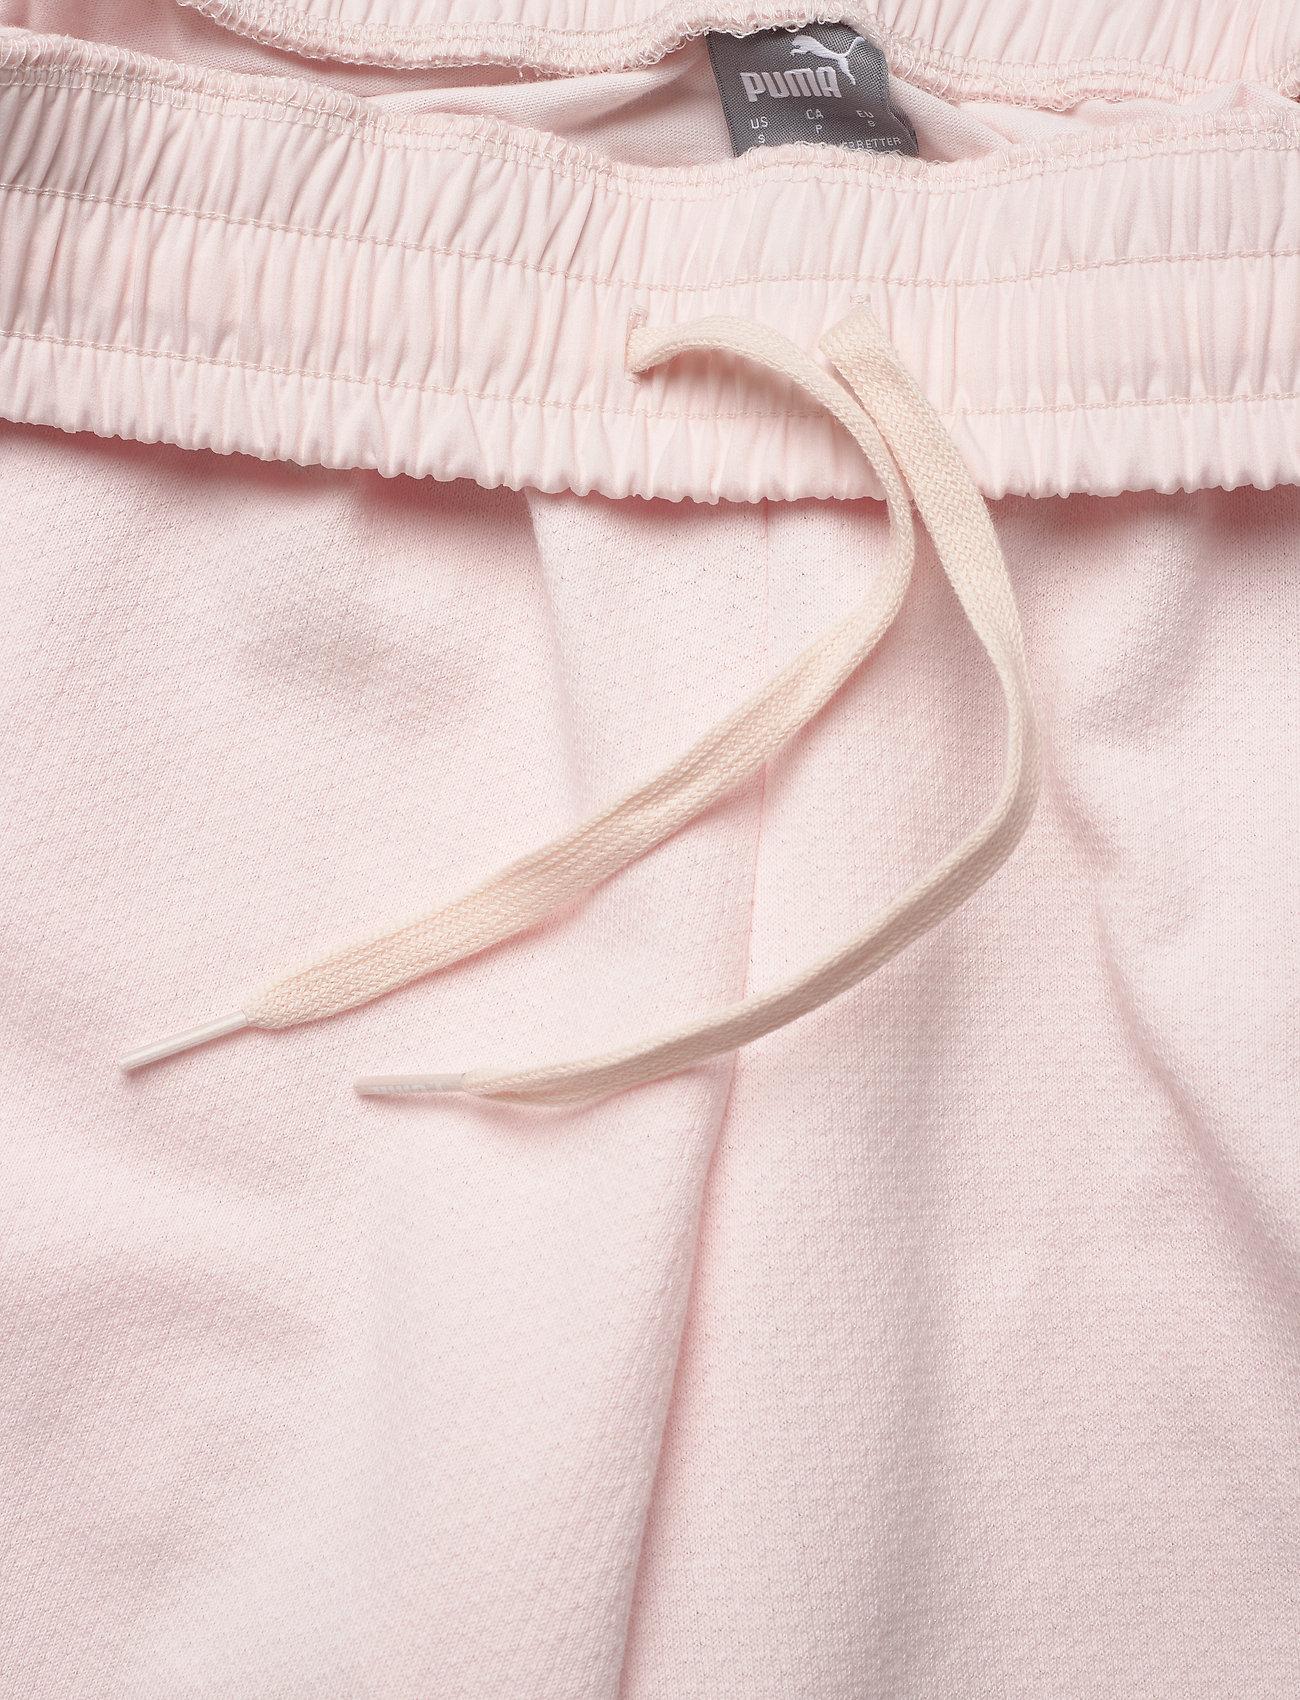 Puma Nu-tility Pants Cl - Sweatpants Rosewater